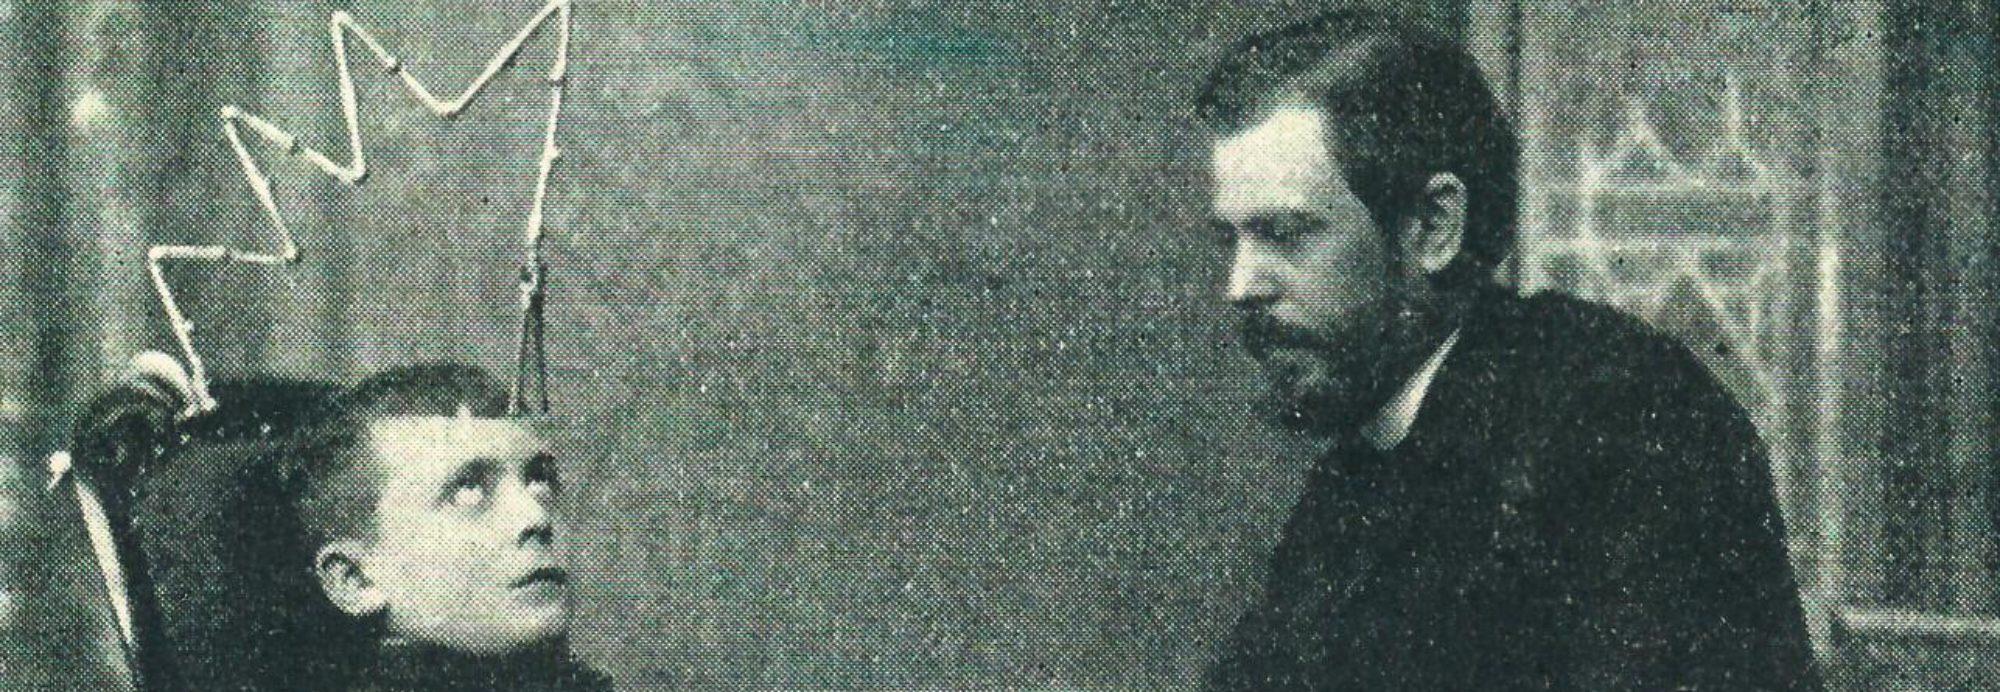 Abdón Sánchez Herrero